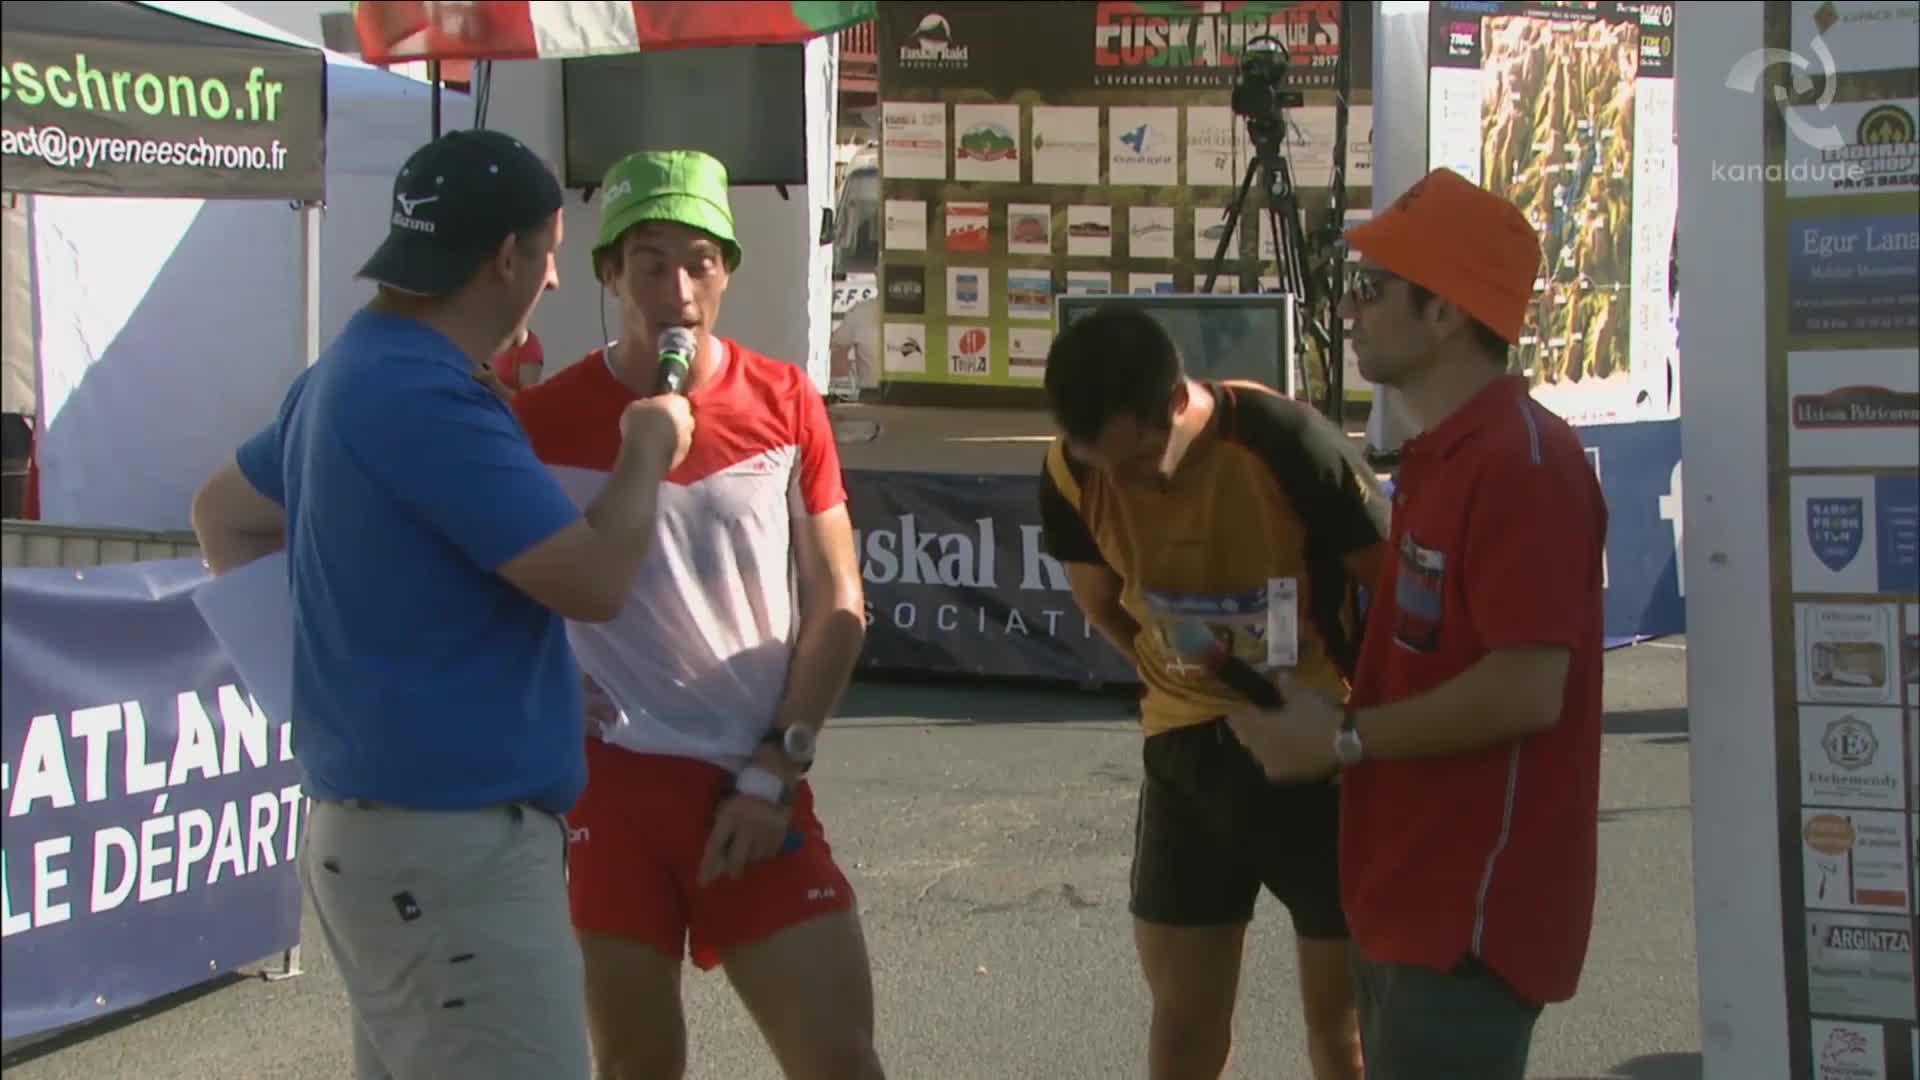 Euskal Trail 2017: Levois Etxeberriren heltzea